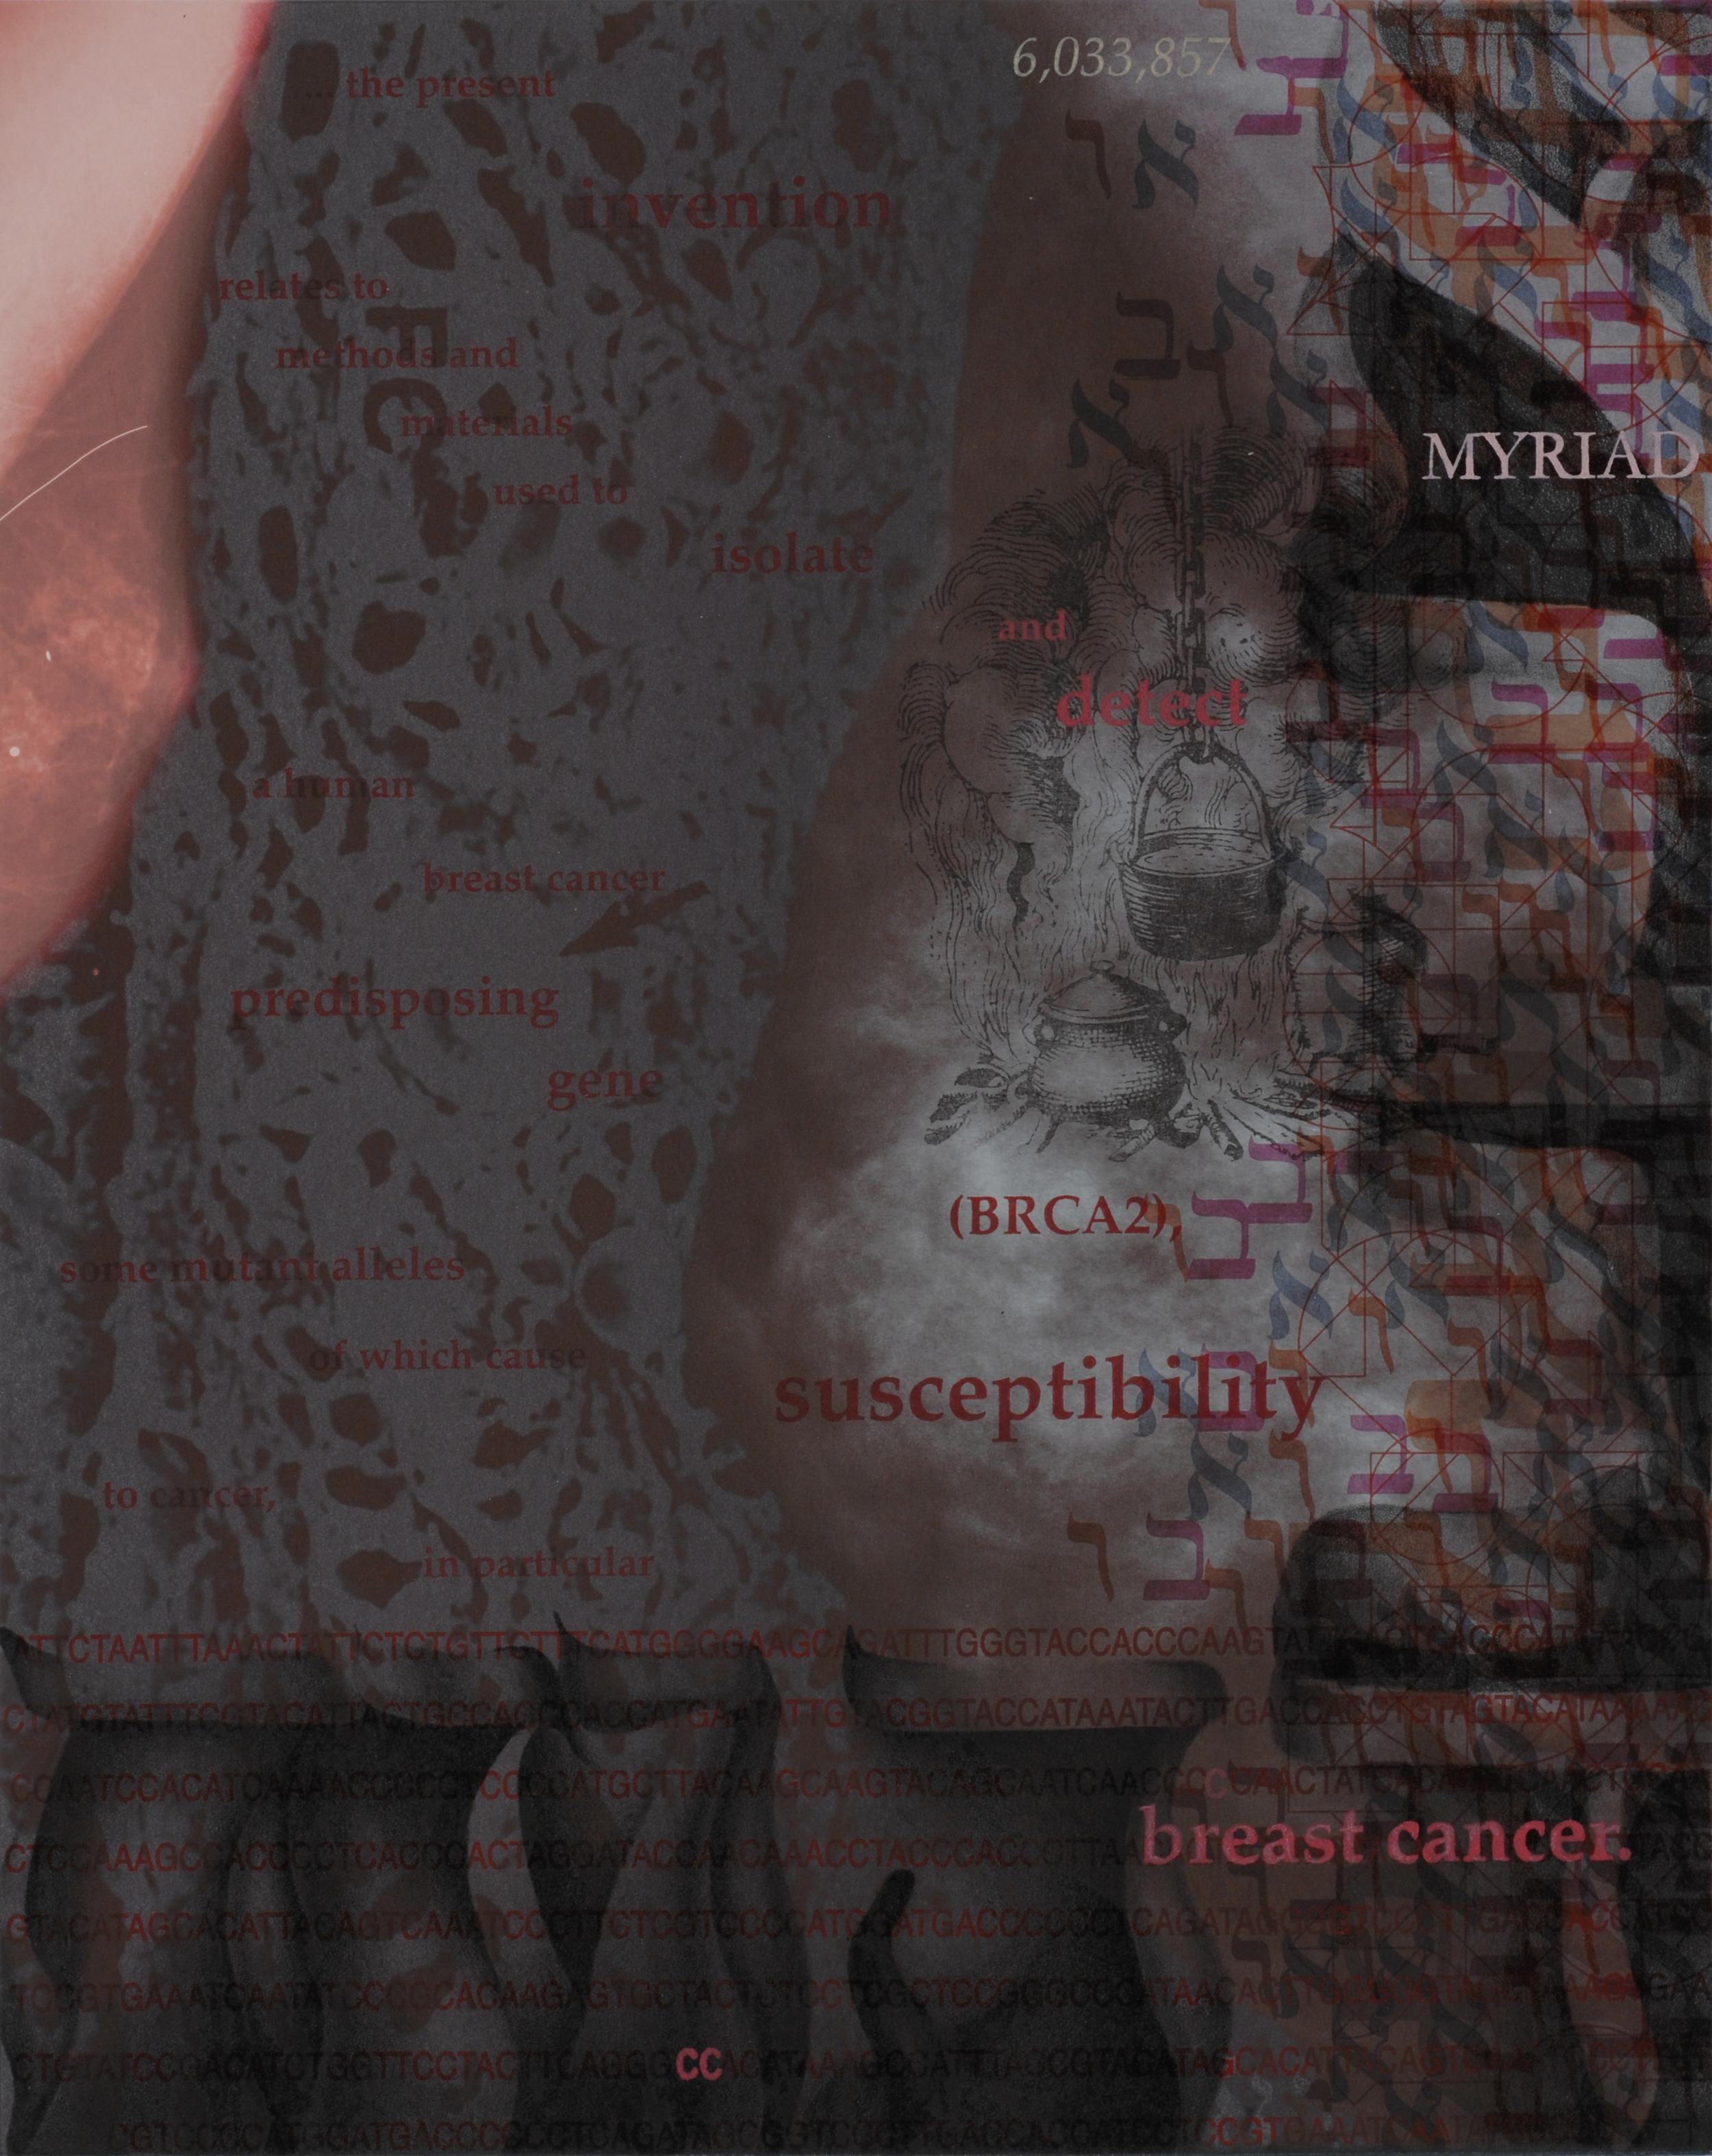 BRCA2: Myriad Susceptibilities 2